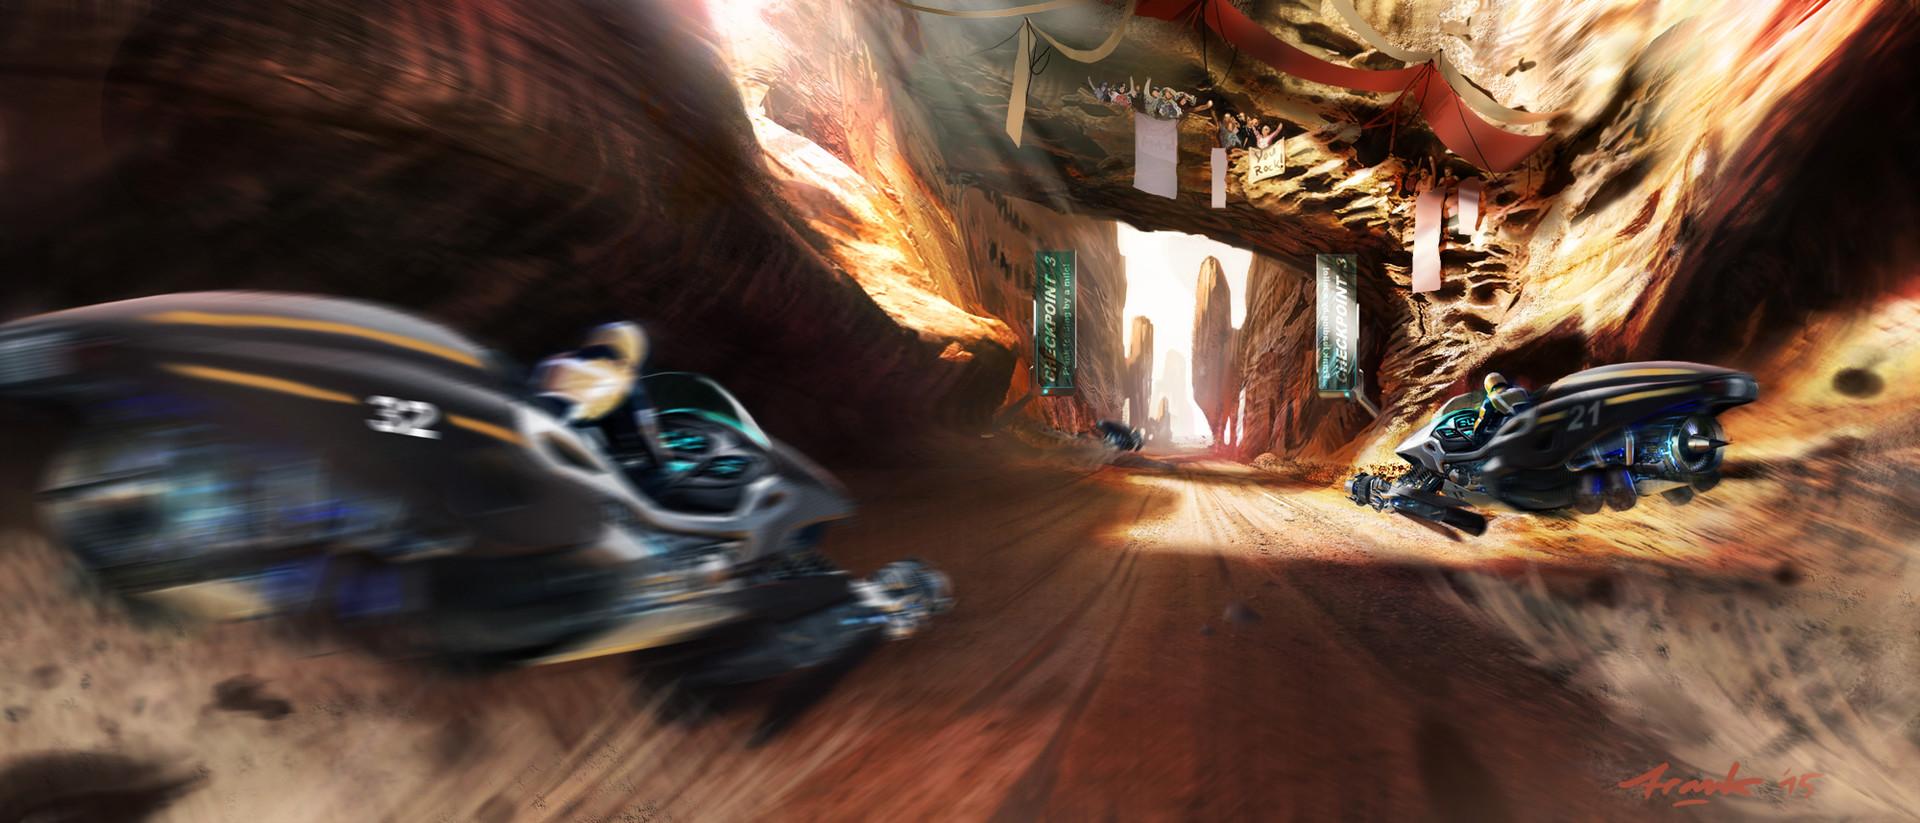 frank-hartenhoff-canyon-race-01.jpg?1505